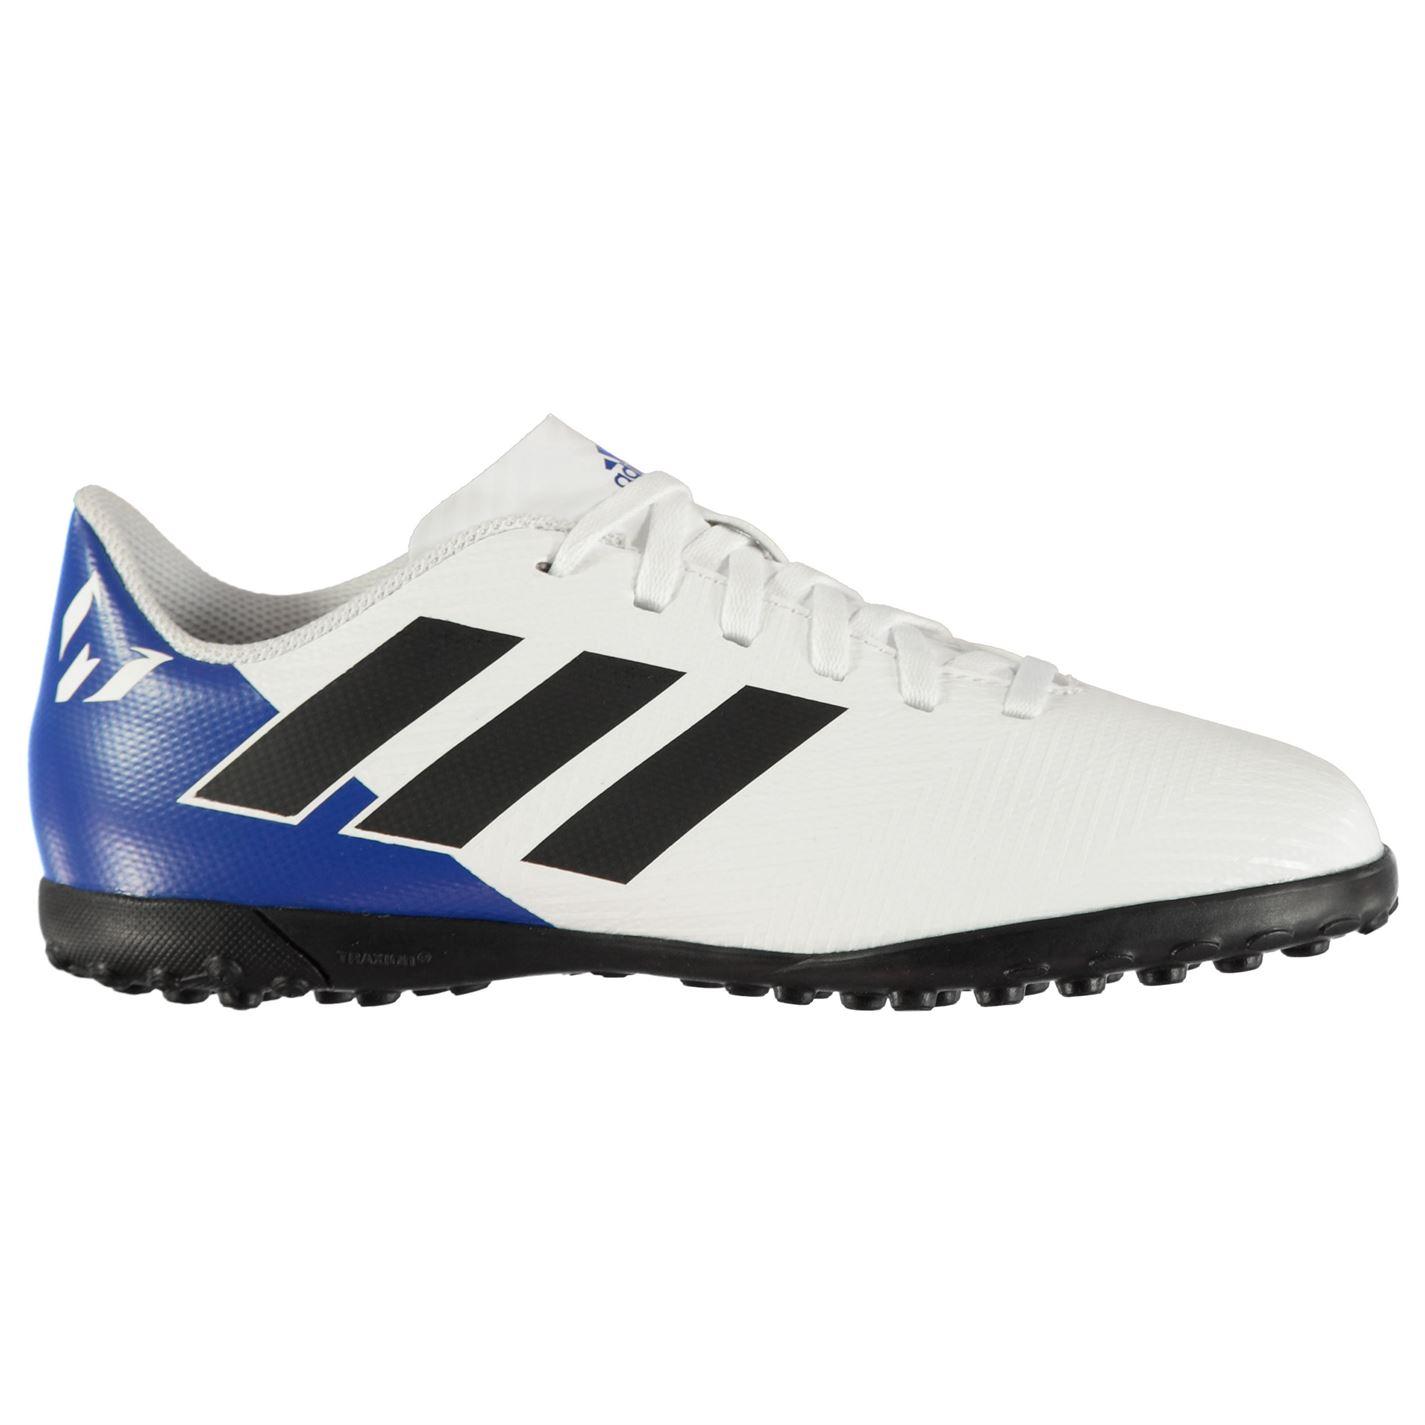 3fa54fd18 Adidas Kids Nemeziz Messi Tango 18.4 Junior Astro Turf Trainers Football  Boots